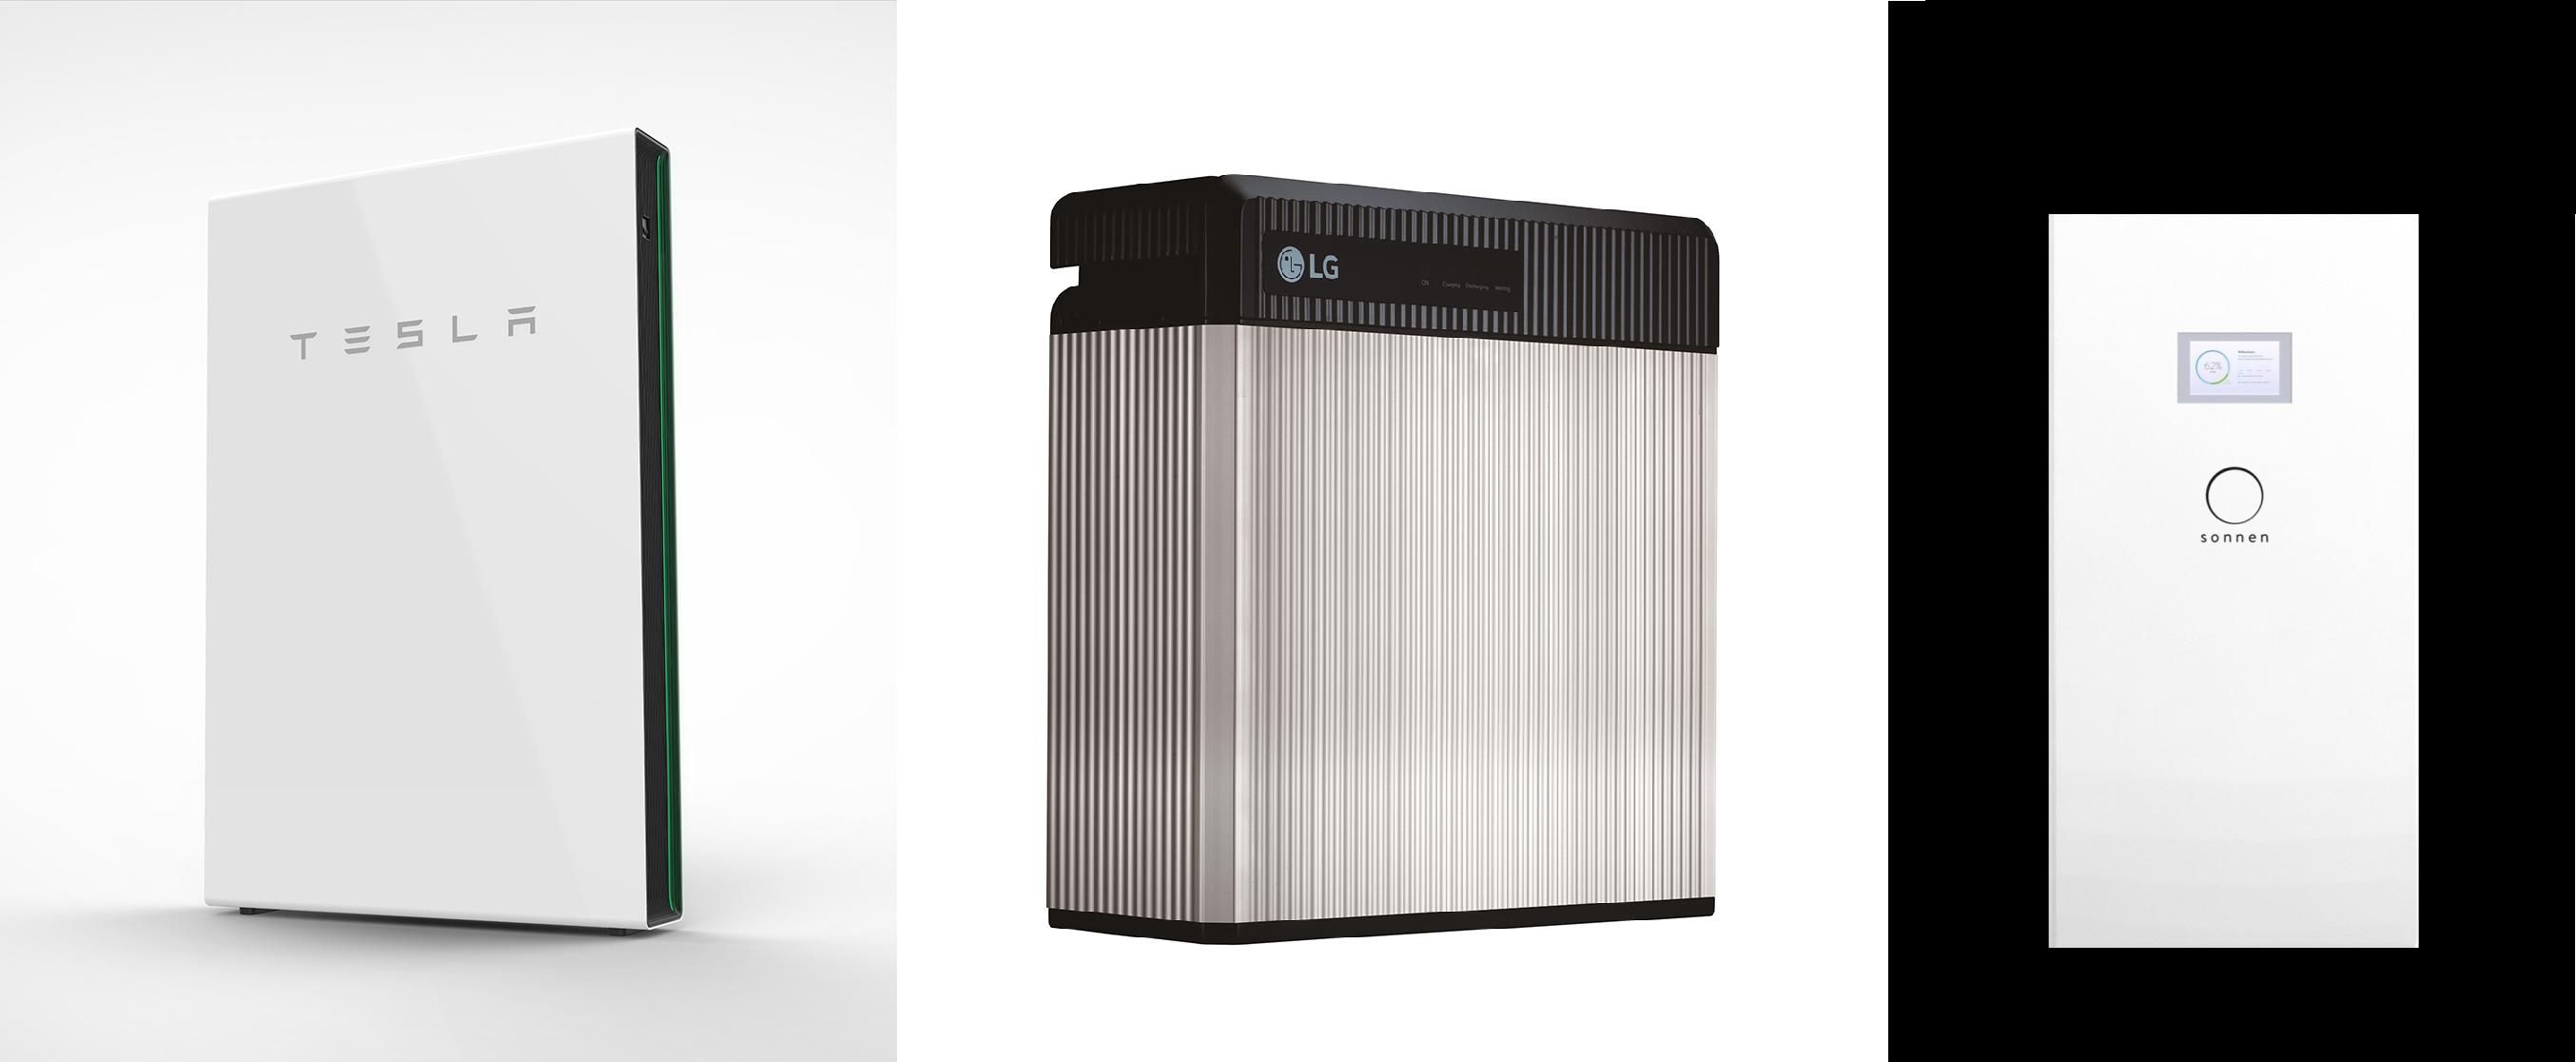 tesla-powerwall-lg-resu-sonnen-eco-compact